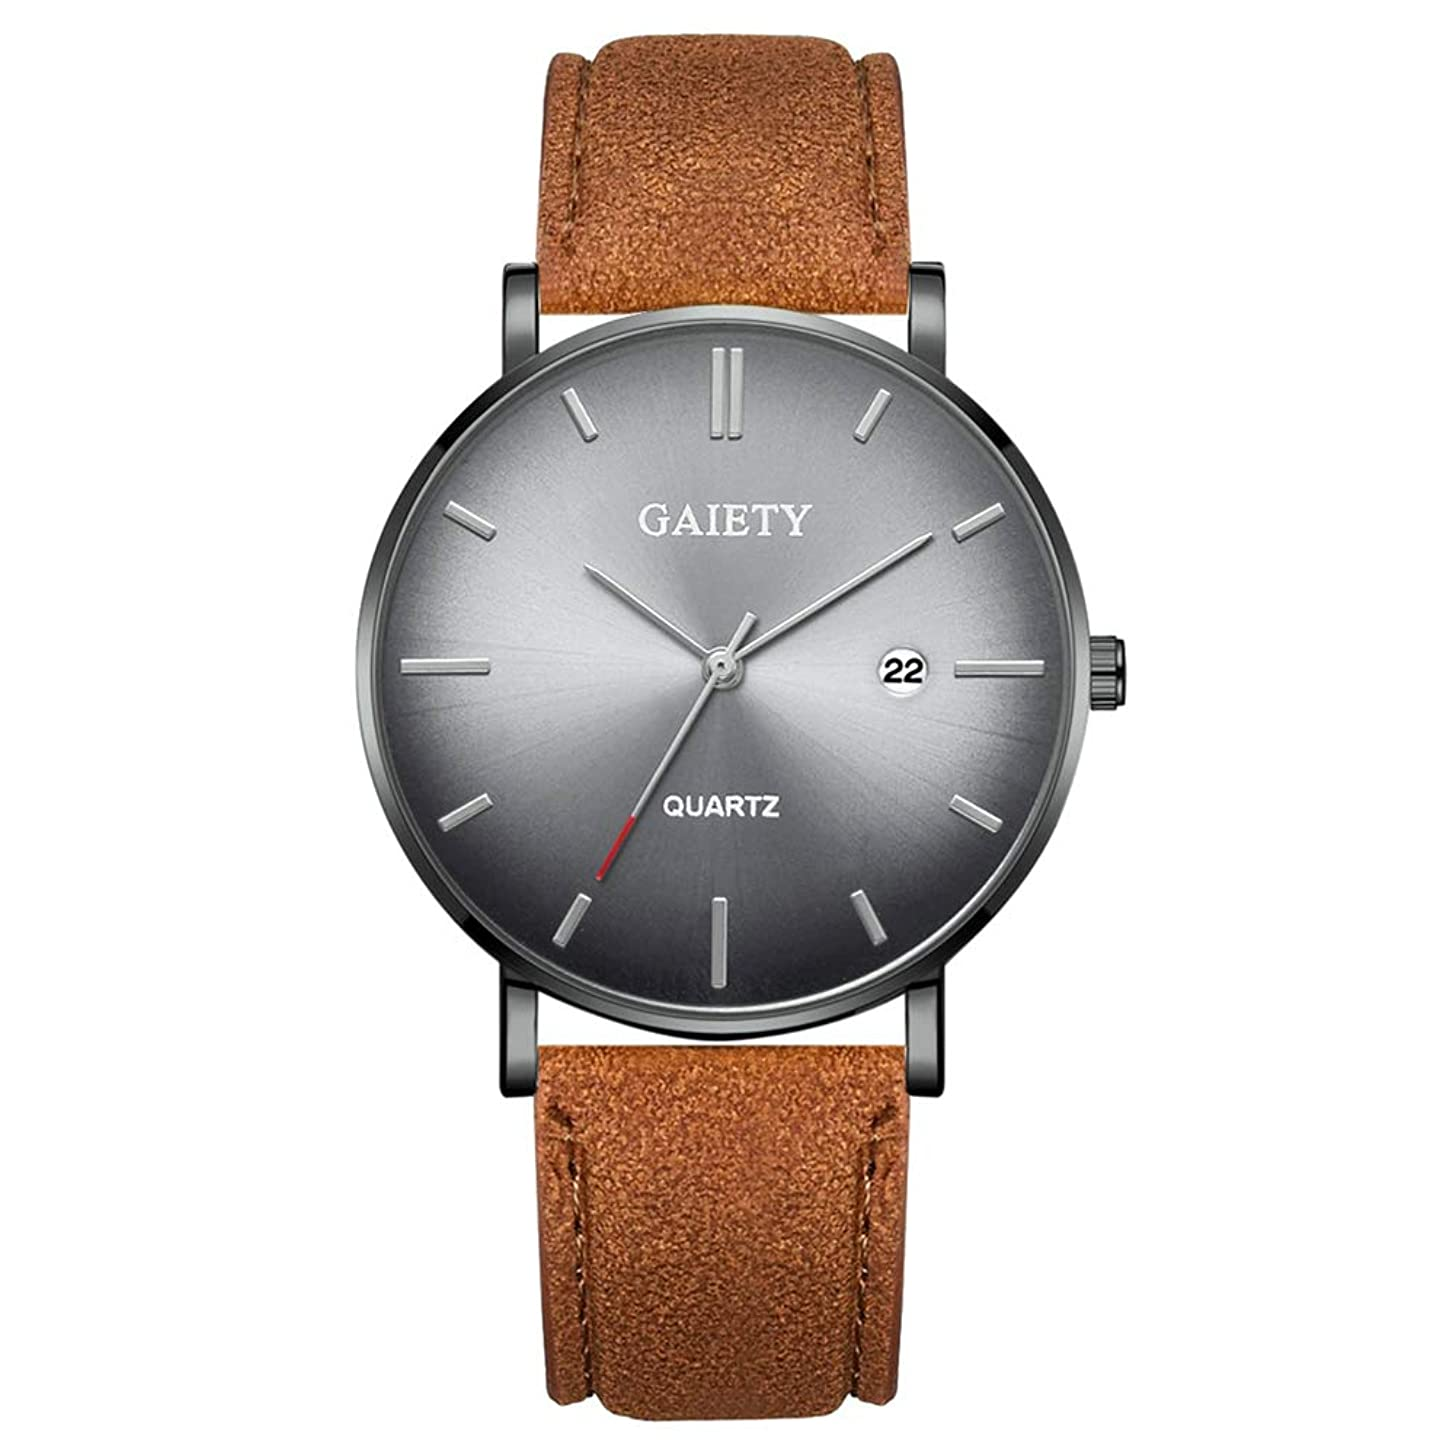 lightclub Simple Men No Number Analog Big Round Dial Faux Leather Band Quartz Wrist Watch for Women Men 10#